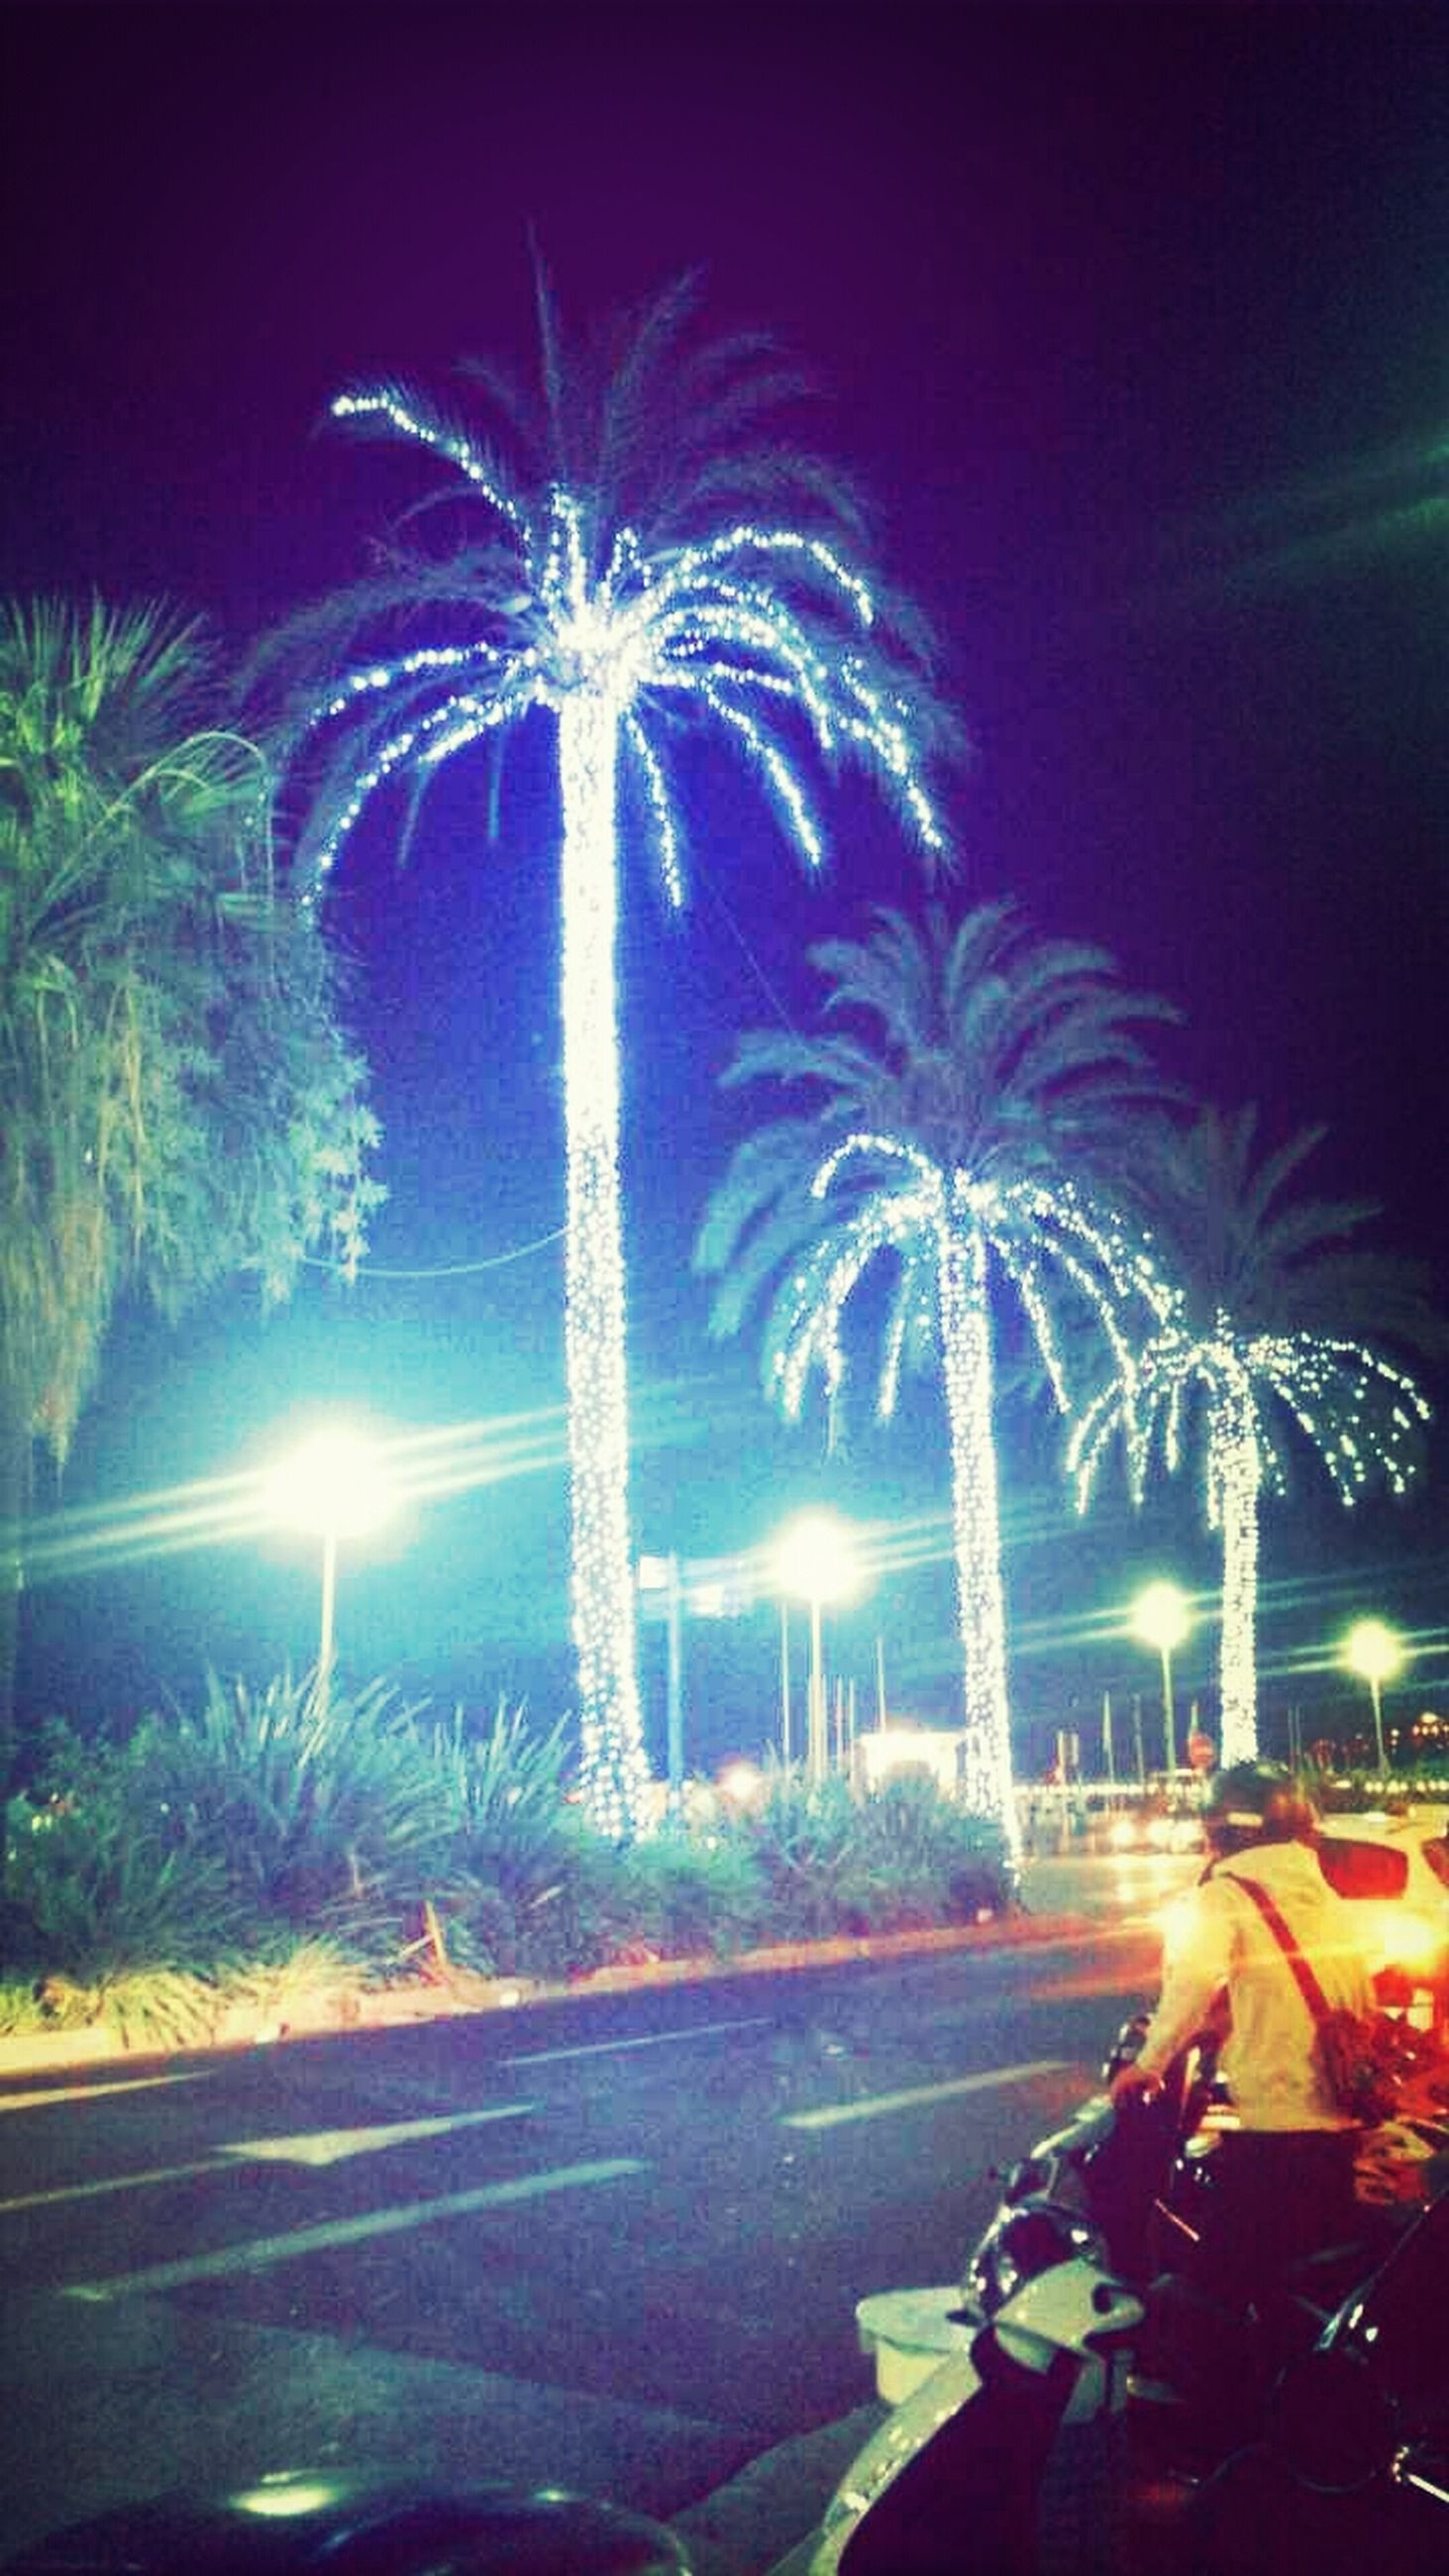 illuminated, night, transportation, car, land vehicle, long exposure, palm tree, street, motion, road, street light, mode of transport, light trail, blurred motion, tree, lighting equipment, speed, city, sky, glowing